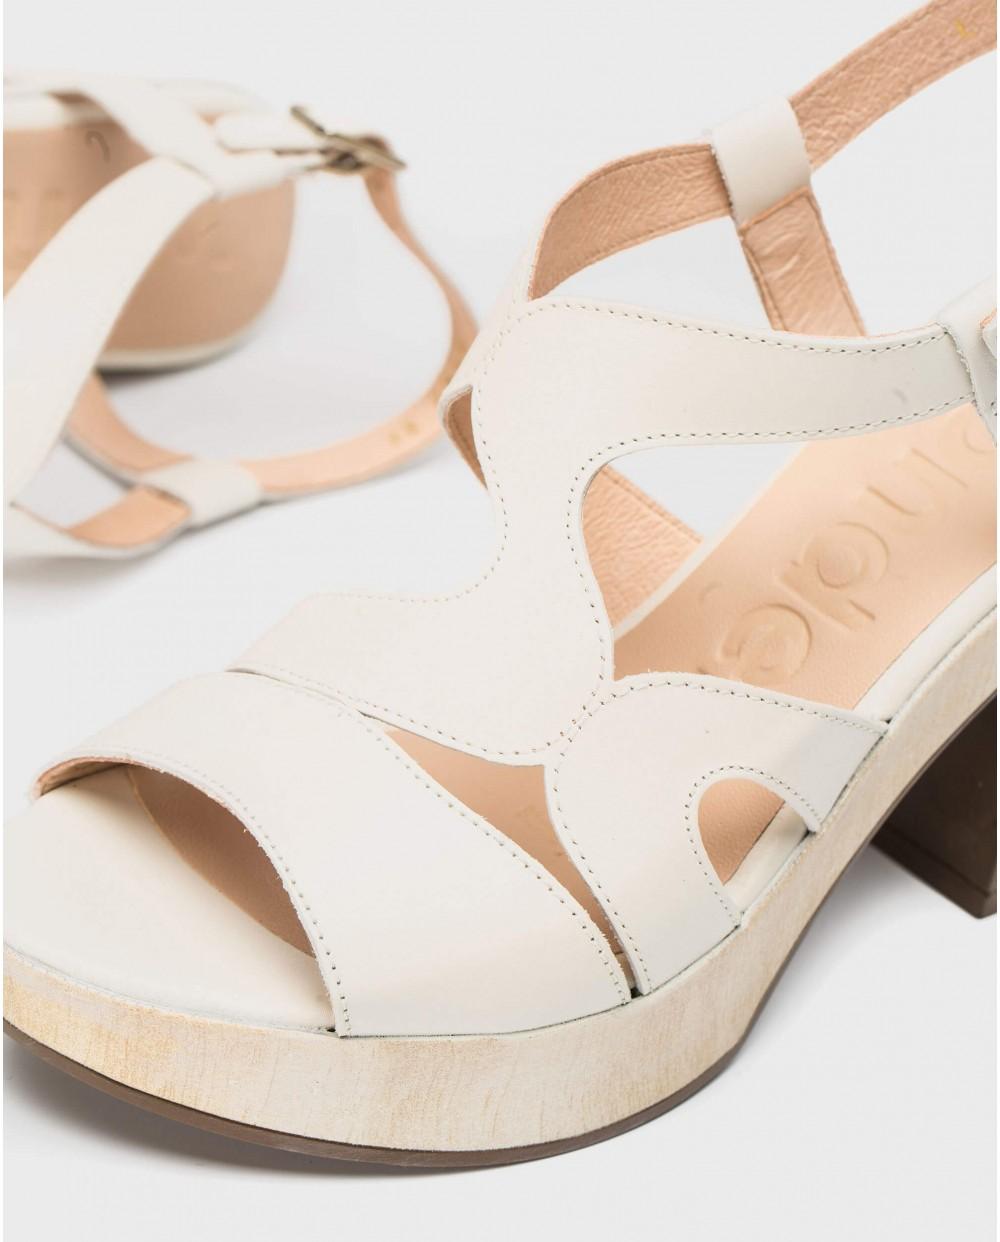 Wonders-Sandals-Platform sandal with wavy straps